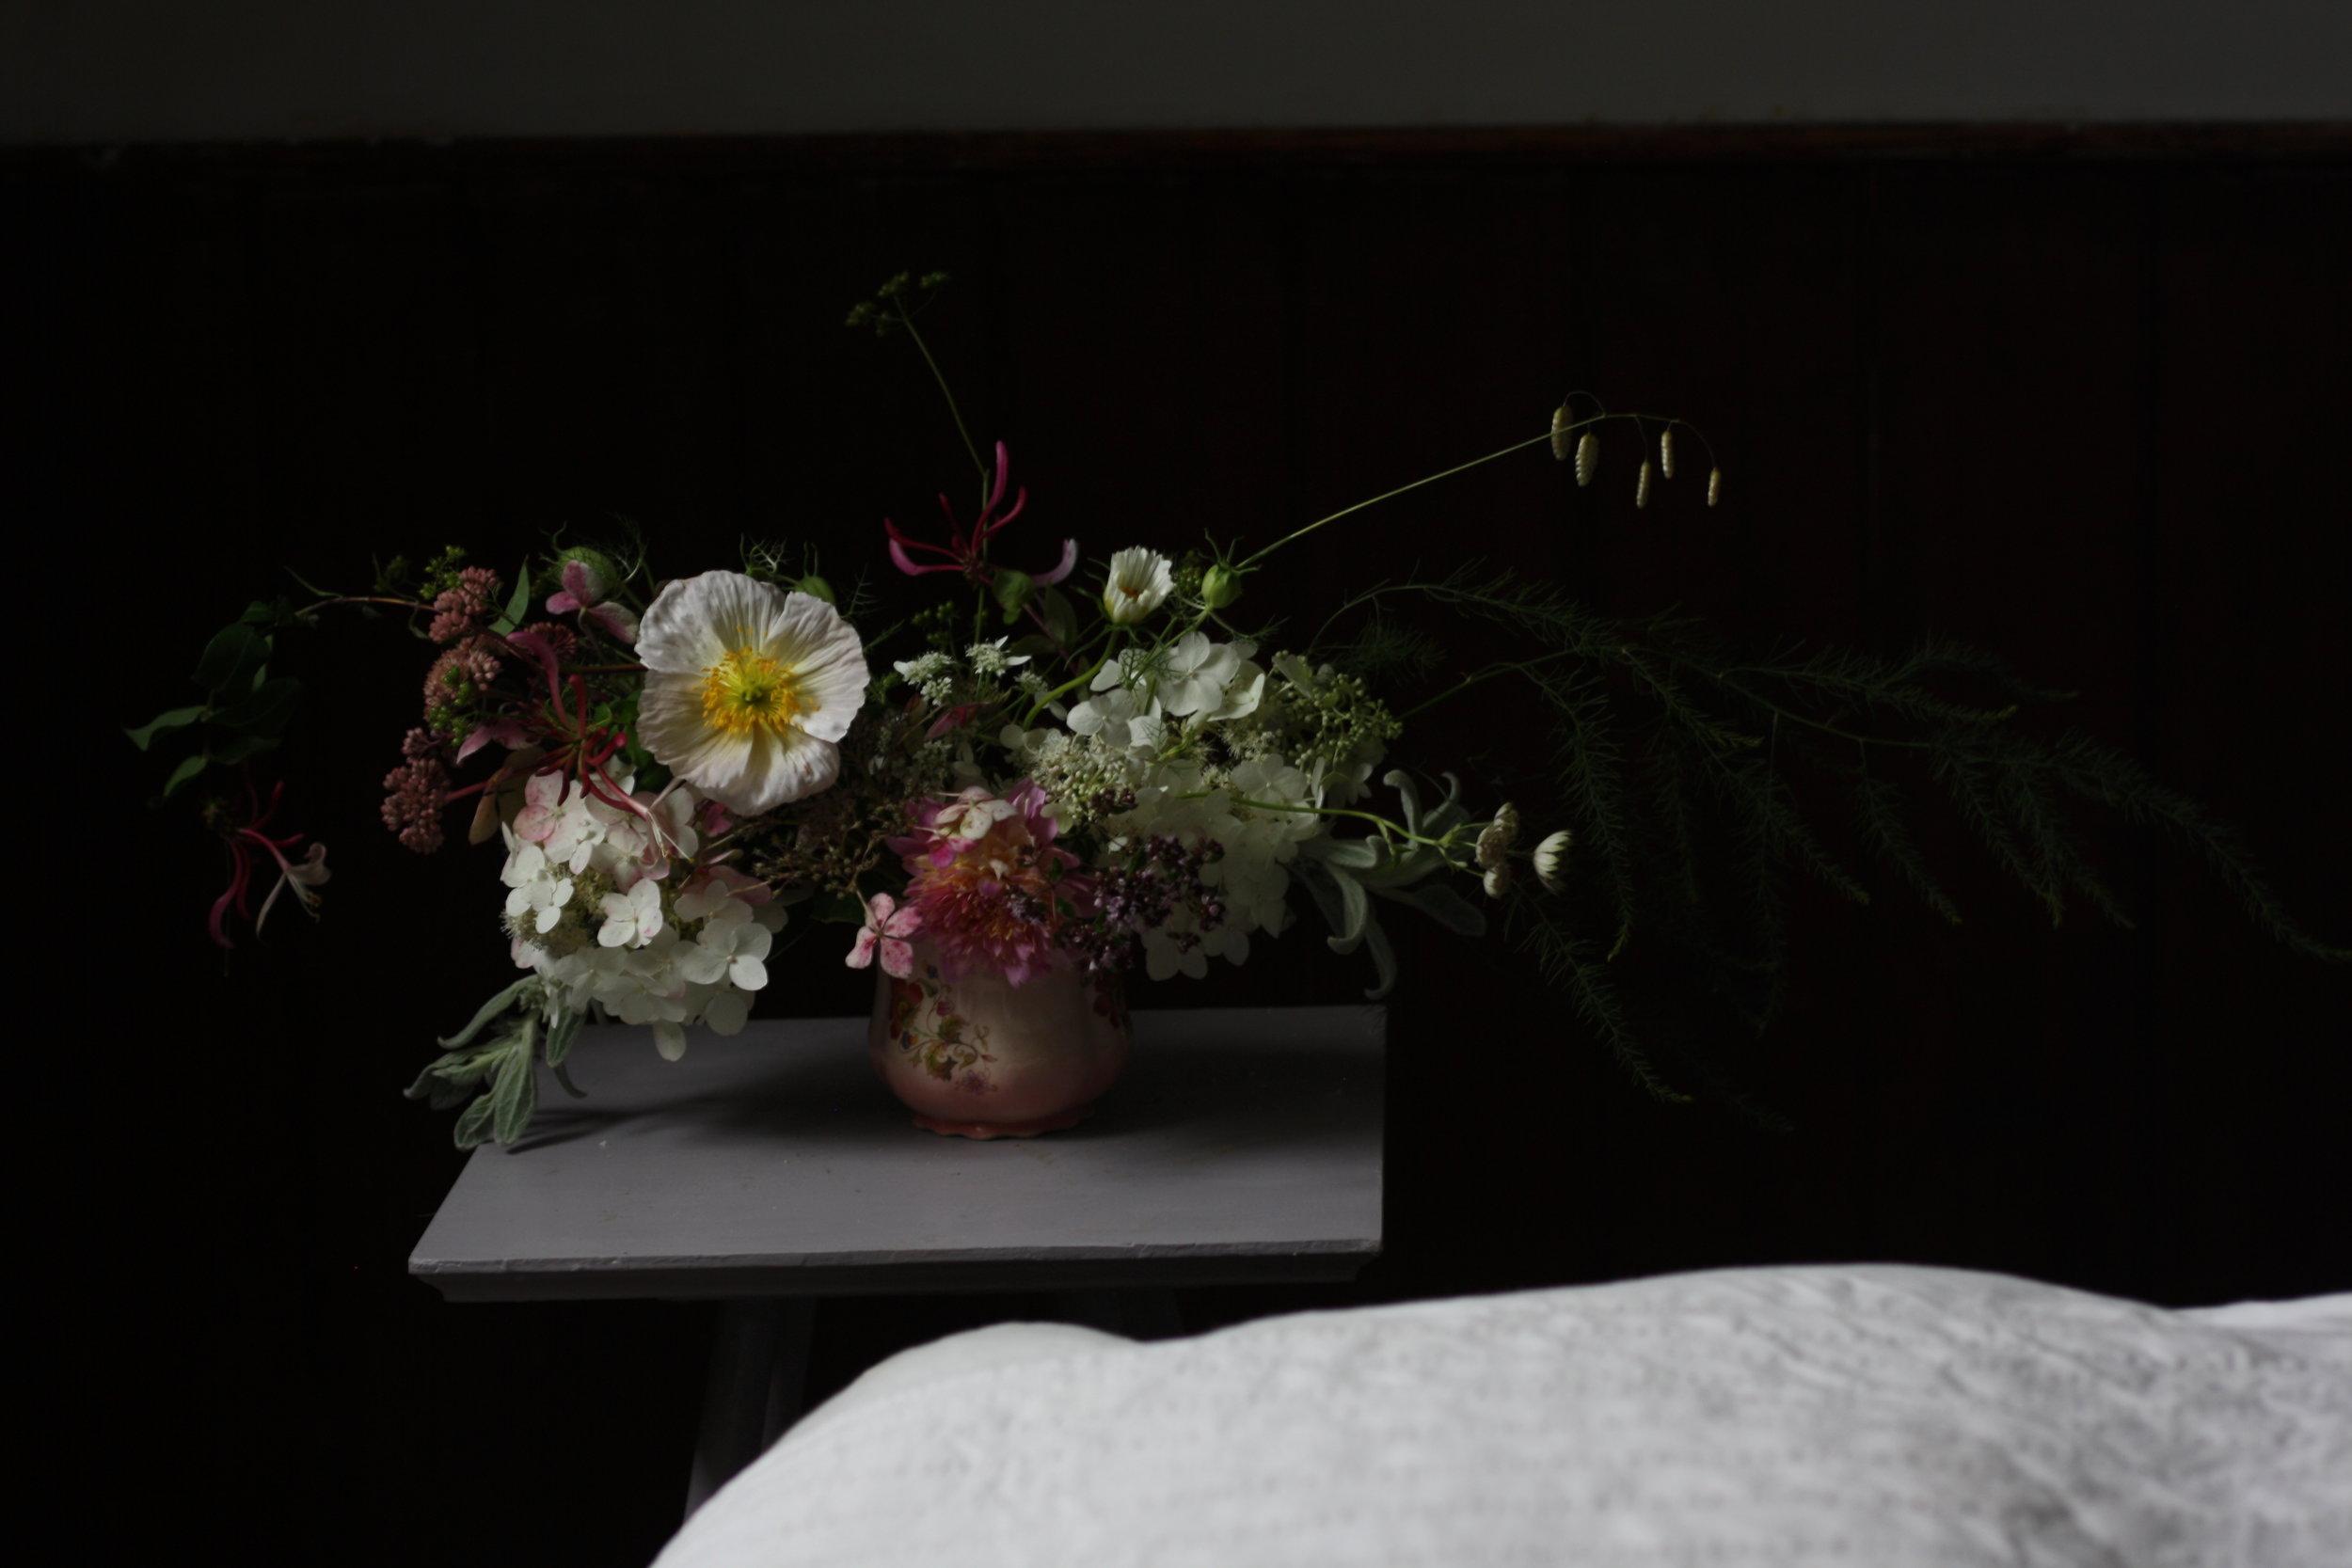 table arrangement with hydragea, honeysuckle, brizia maxima and Colibri iceland poppy 'Bianco'. Hedgerow Flower Company, Nova Scotia, Canada